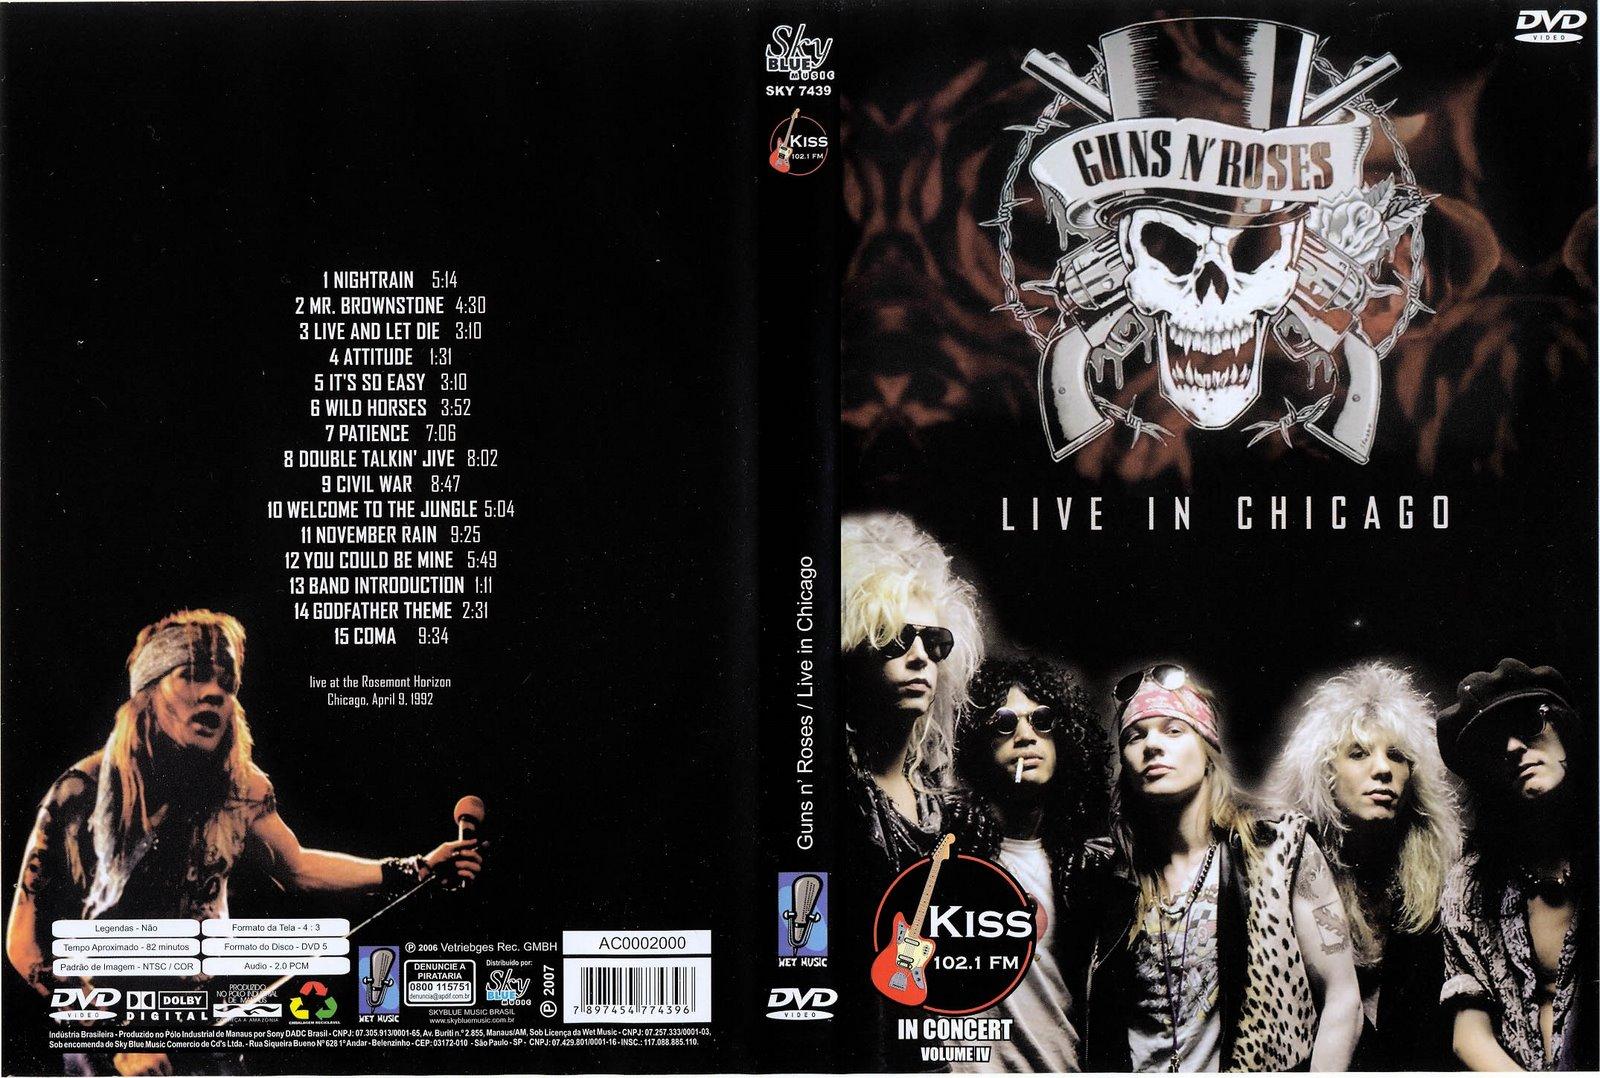 http://2.bp.blogspot.com/_C1RHYFhK1Cc/S7u6xCUcLII/AAAAAAAAA4c/urzbIrThJXU/s1600/Guns_n_Roses_Live_In_Chicago.jpg